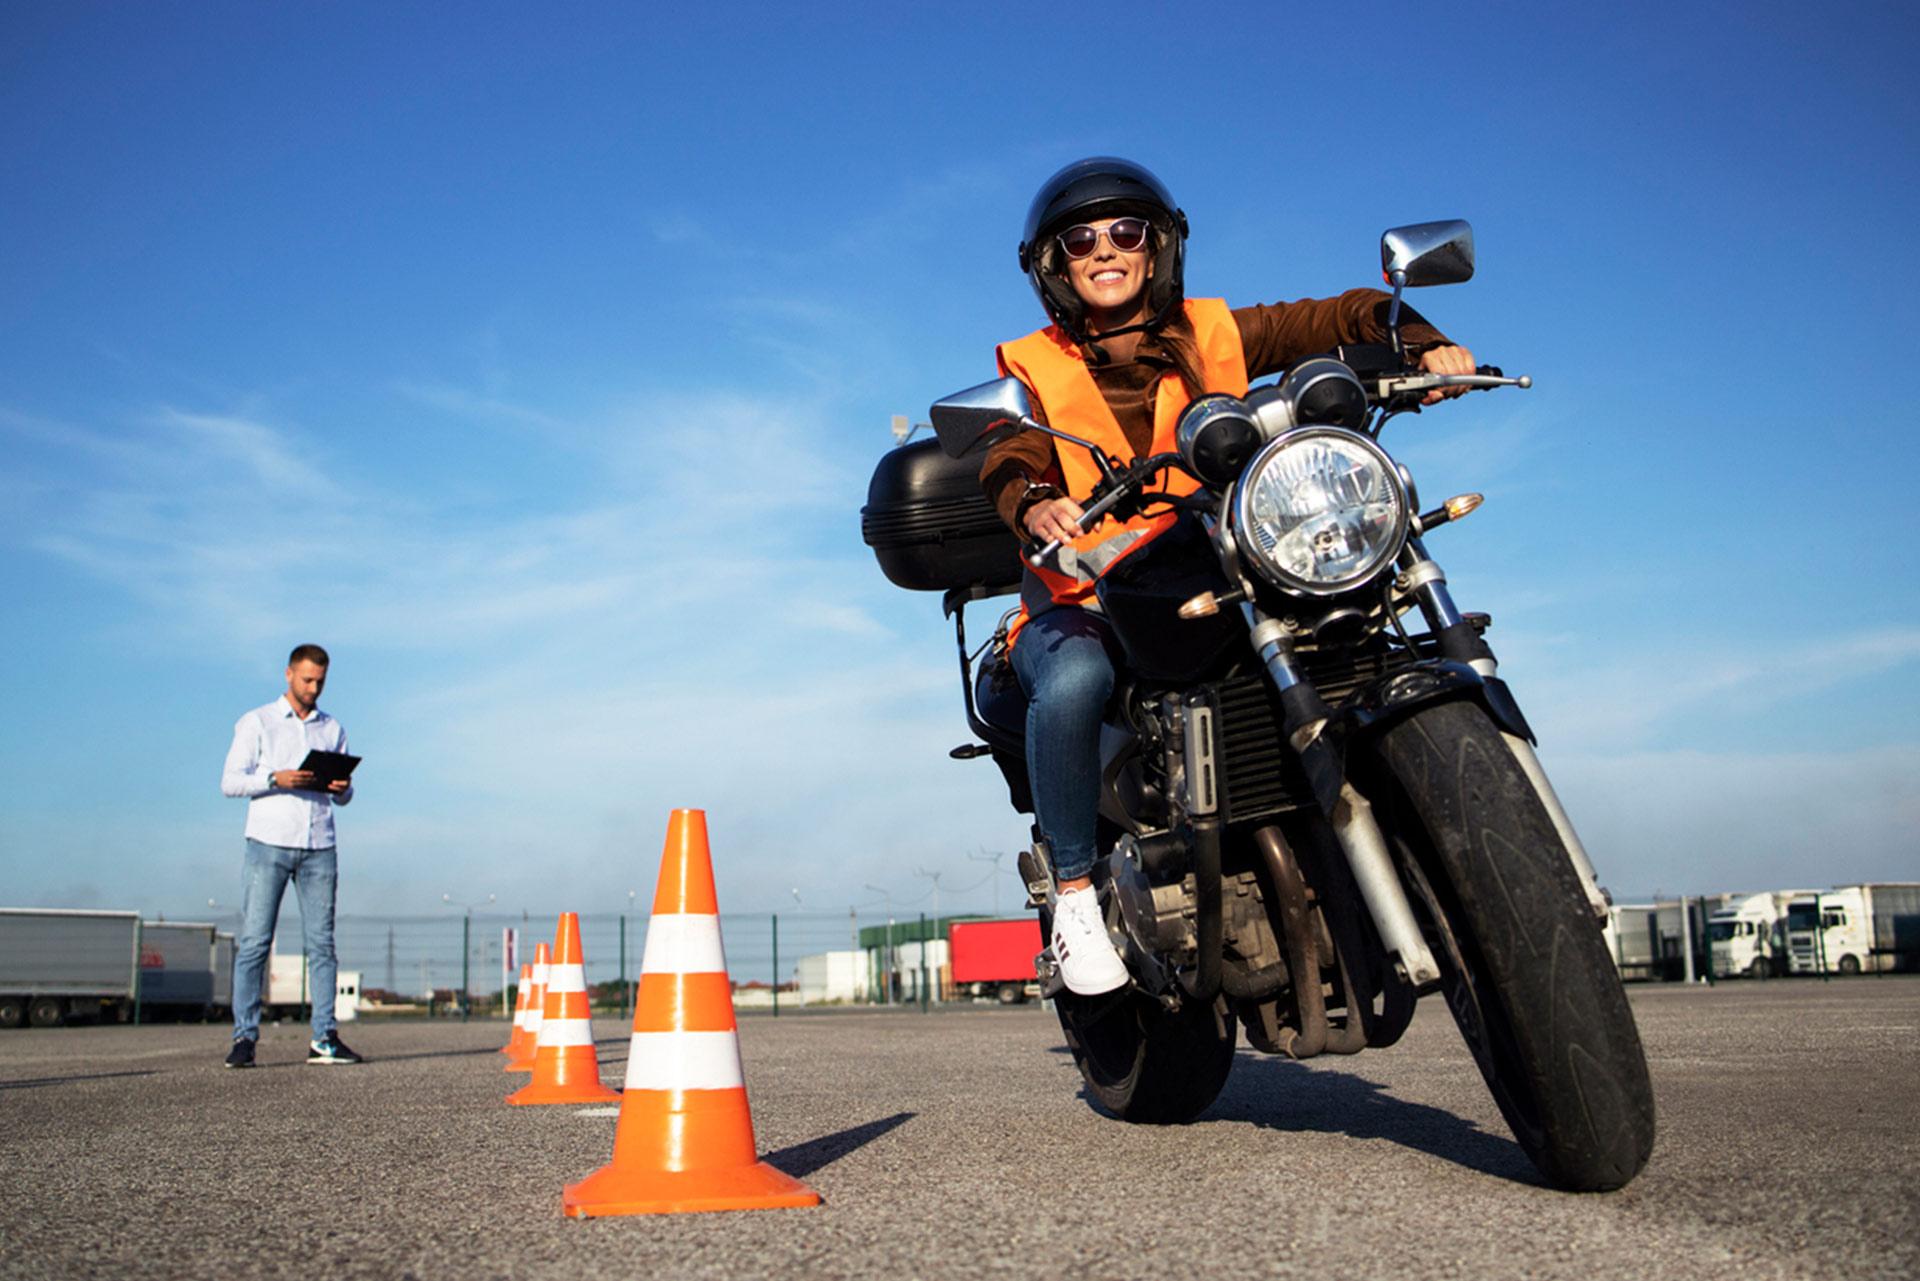 Fahrschule Mike Andrys - Zweirad-Führerschein